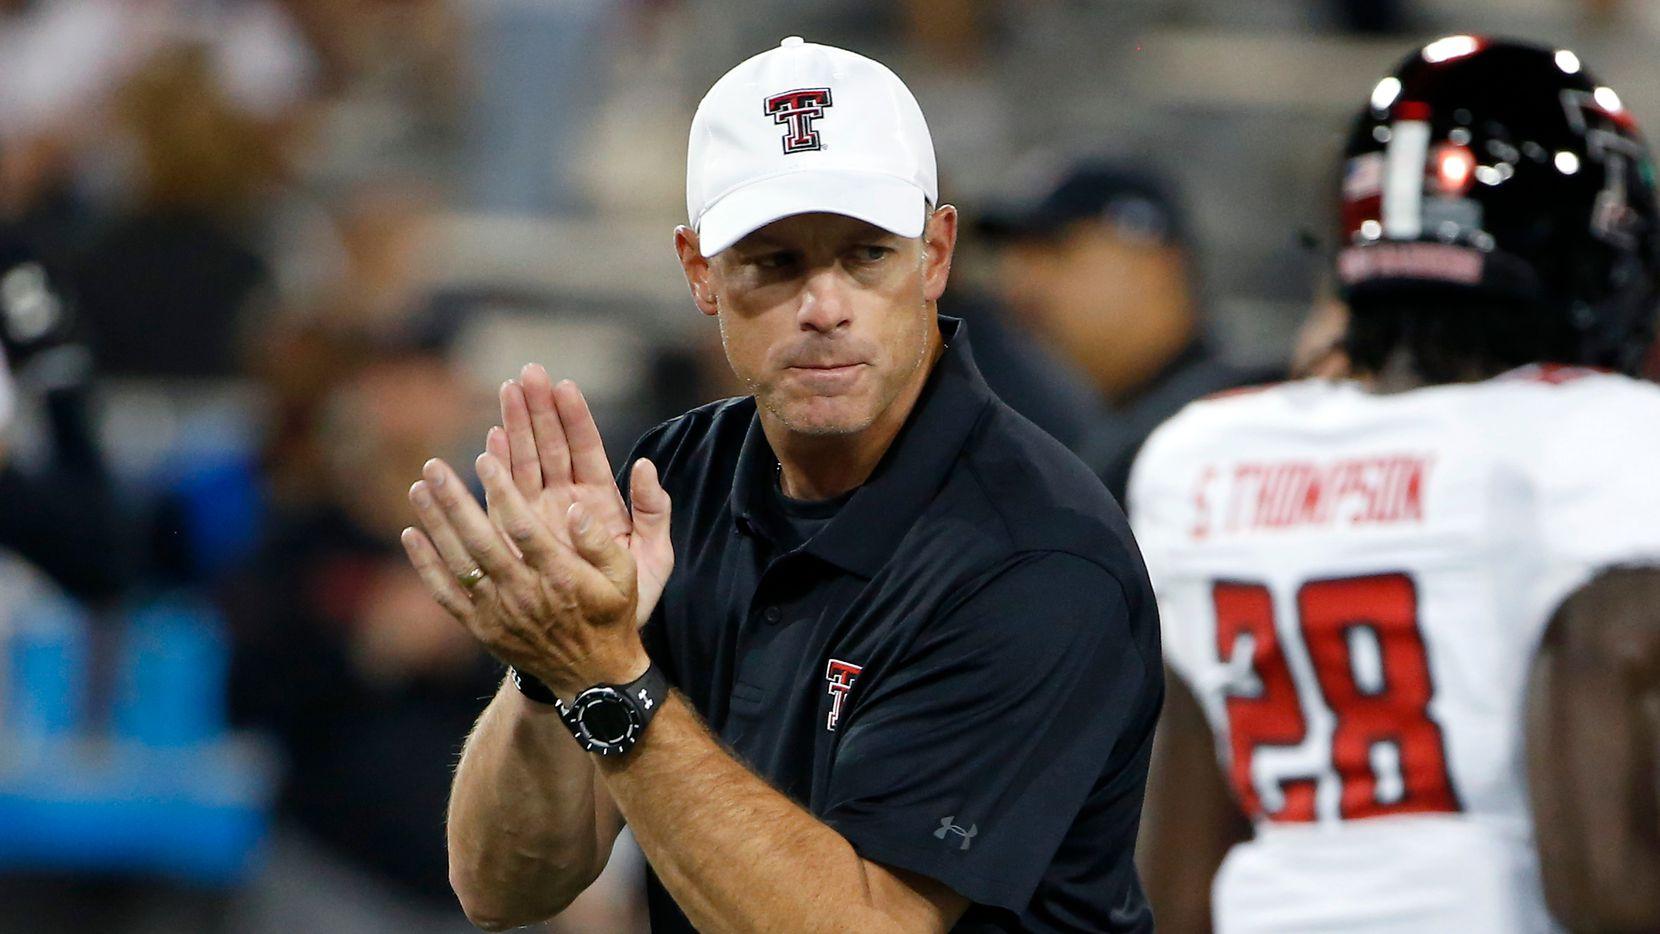 Texas Tech head coach Matt Wells prior to an NCAA college football game against Arizona, Saturday, Sept. 14, 2019, in Tucson, Ariz. (AP Photo/Ralph Freso) ORG XMIT: NYOTK